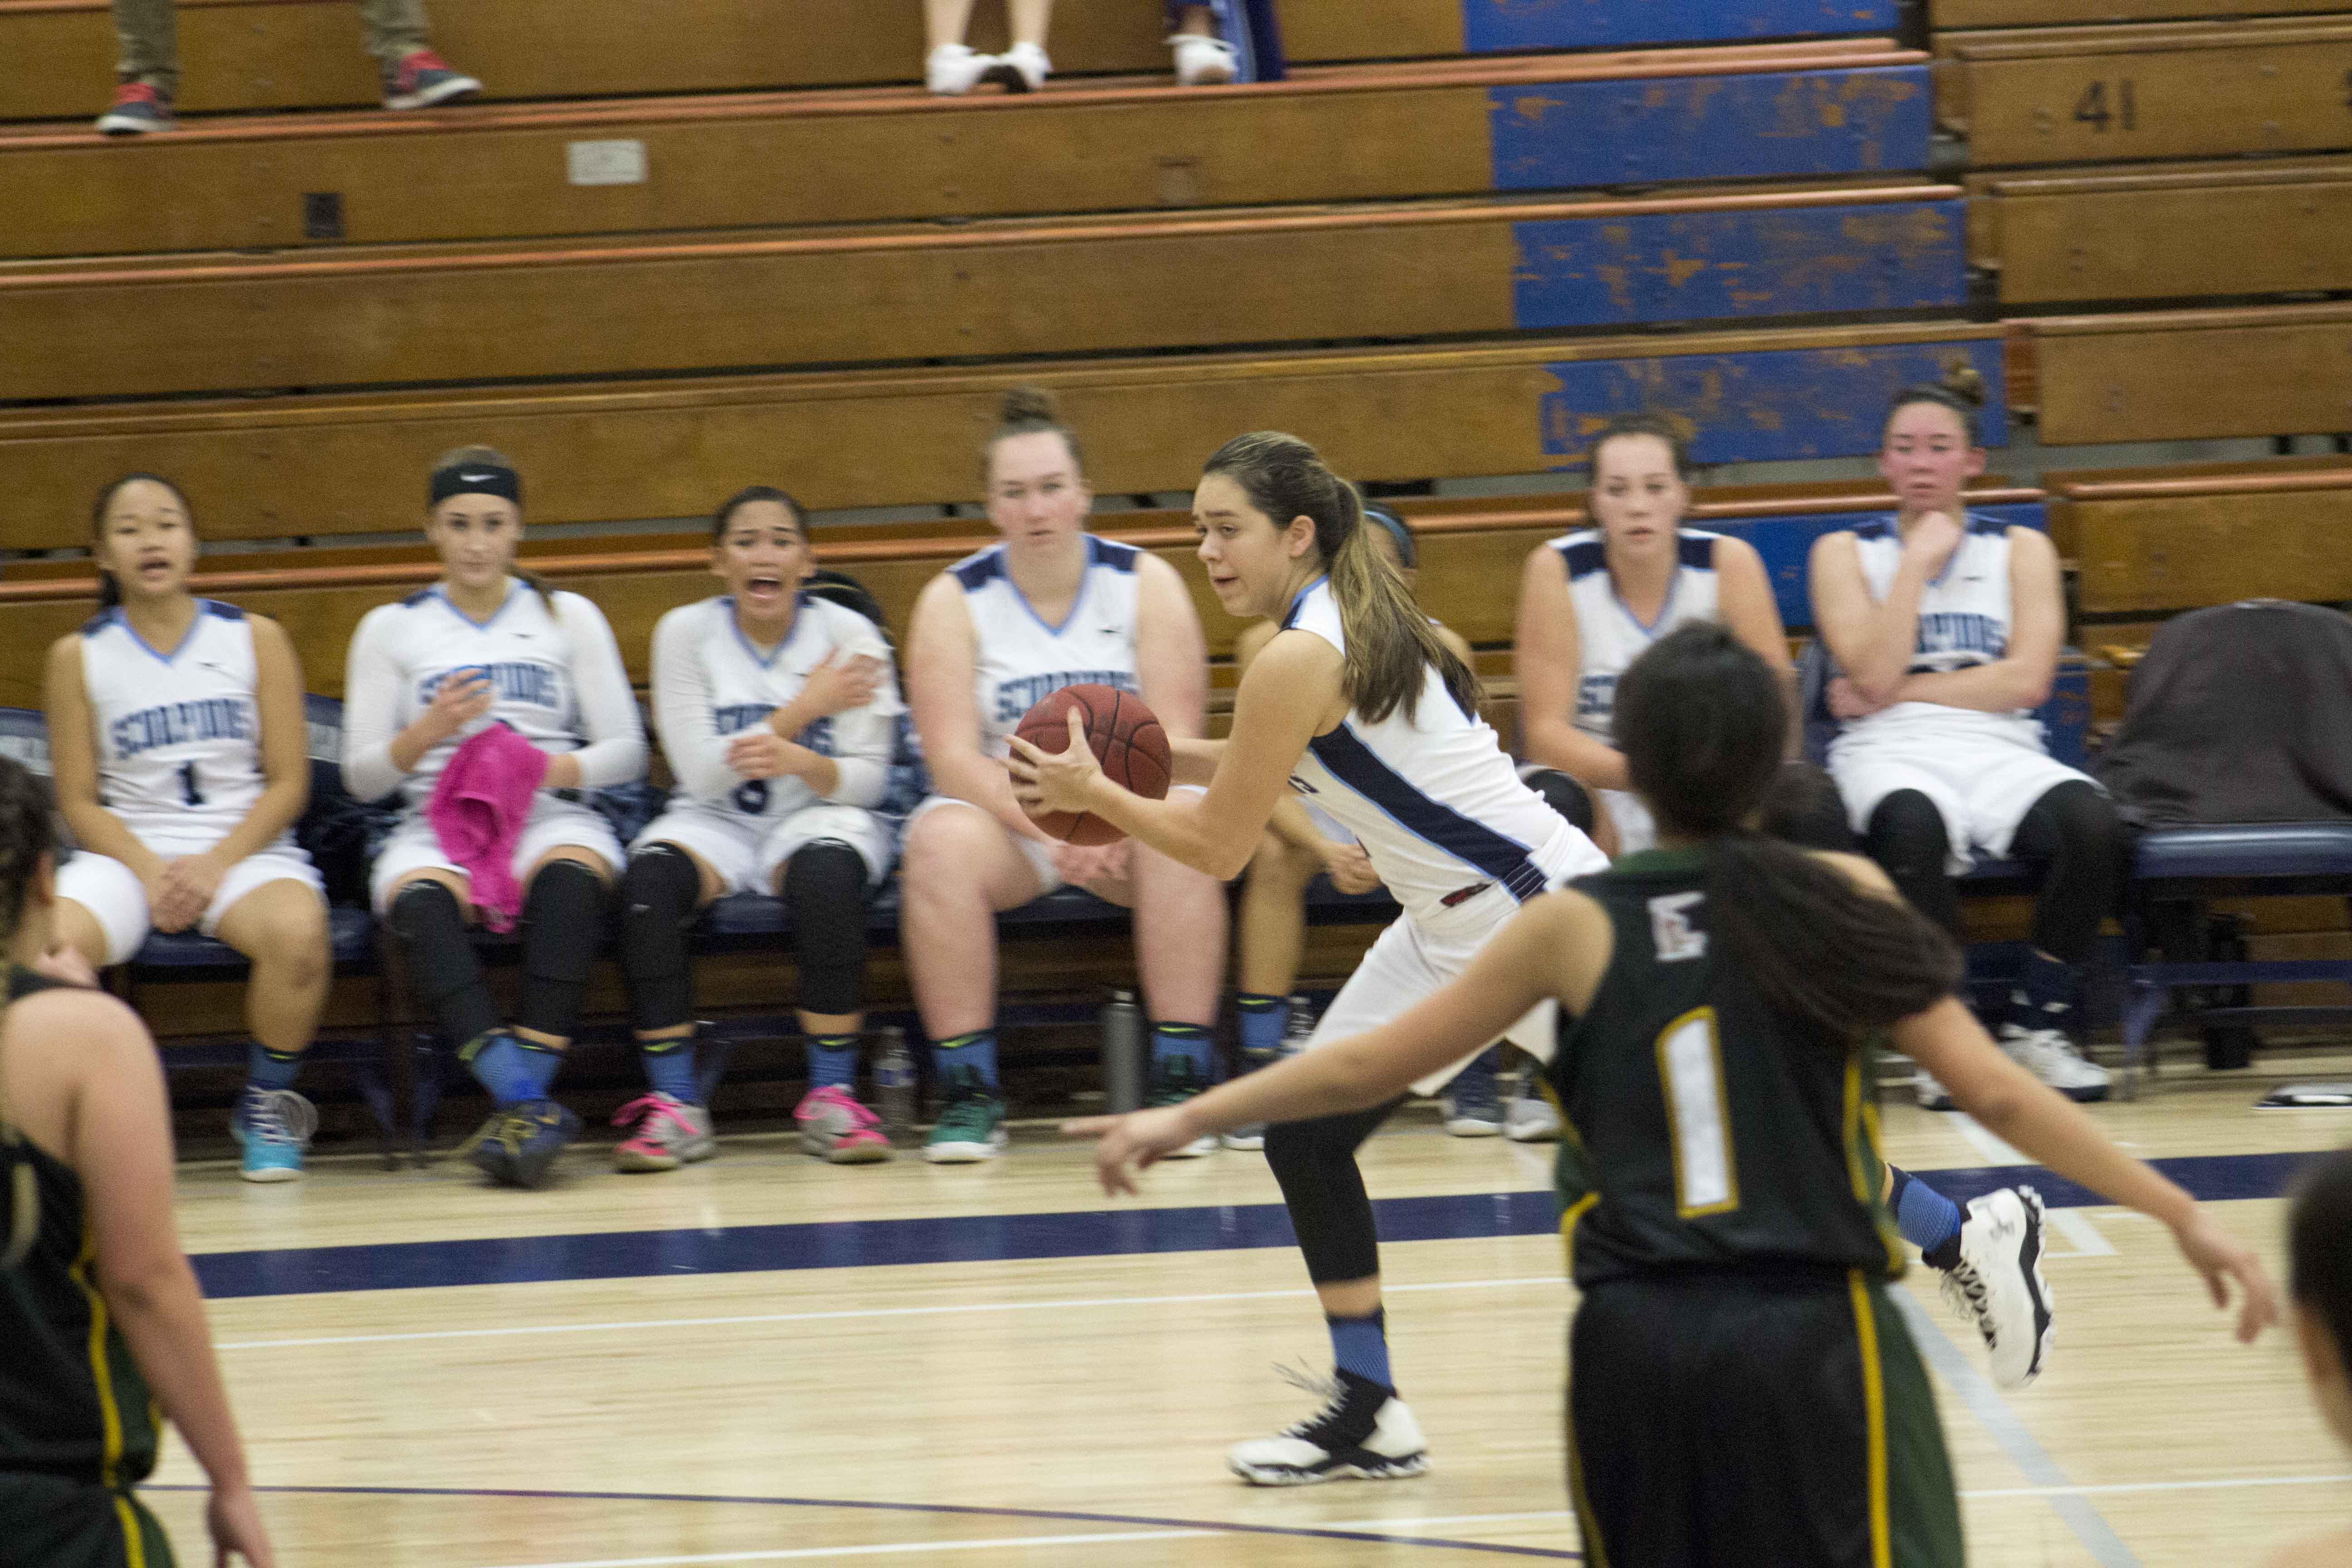 Alyssa Marin, freshman, looks to pass the ball.